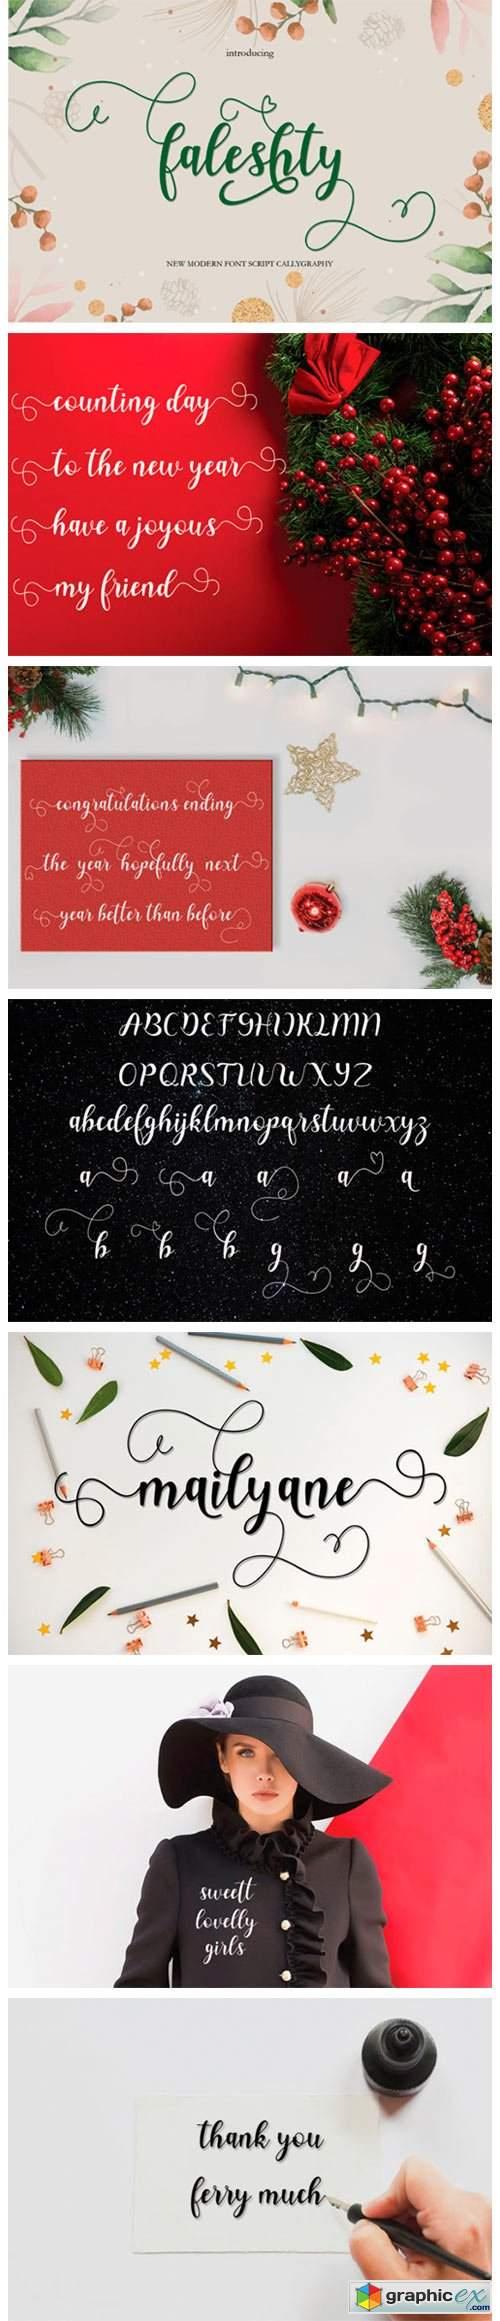 Faleshty Font